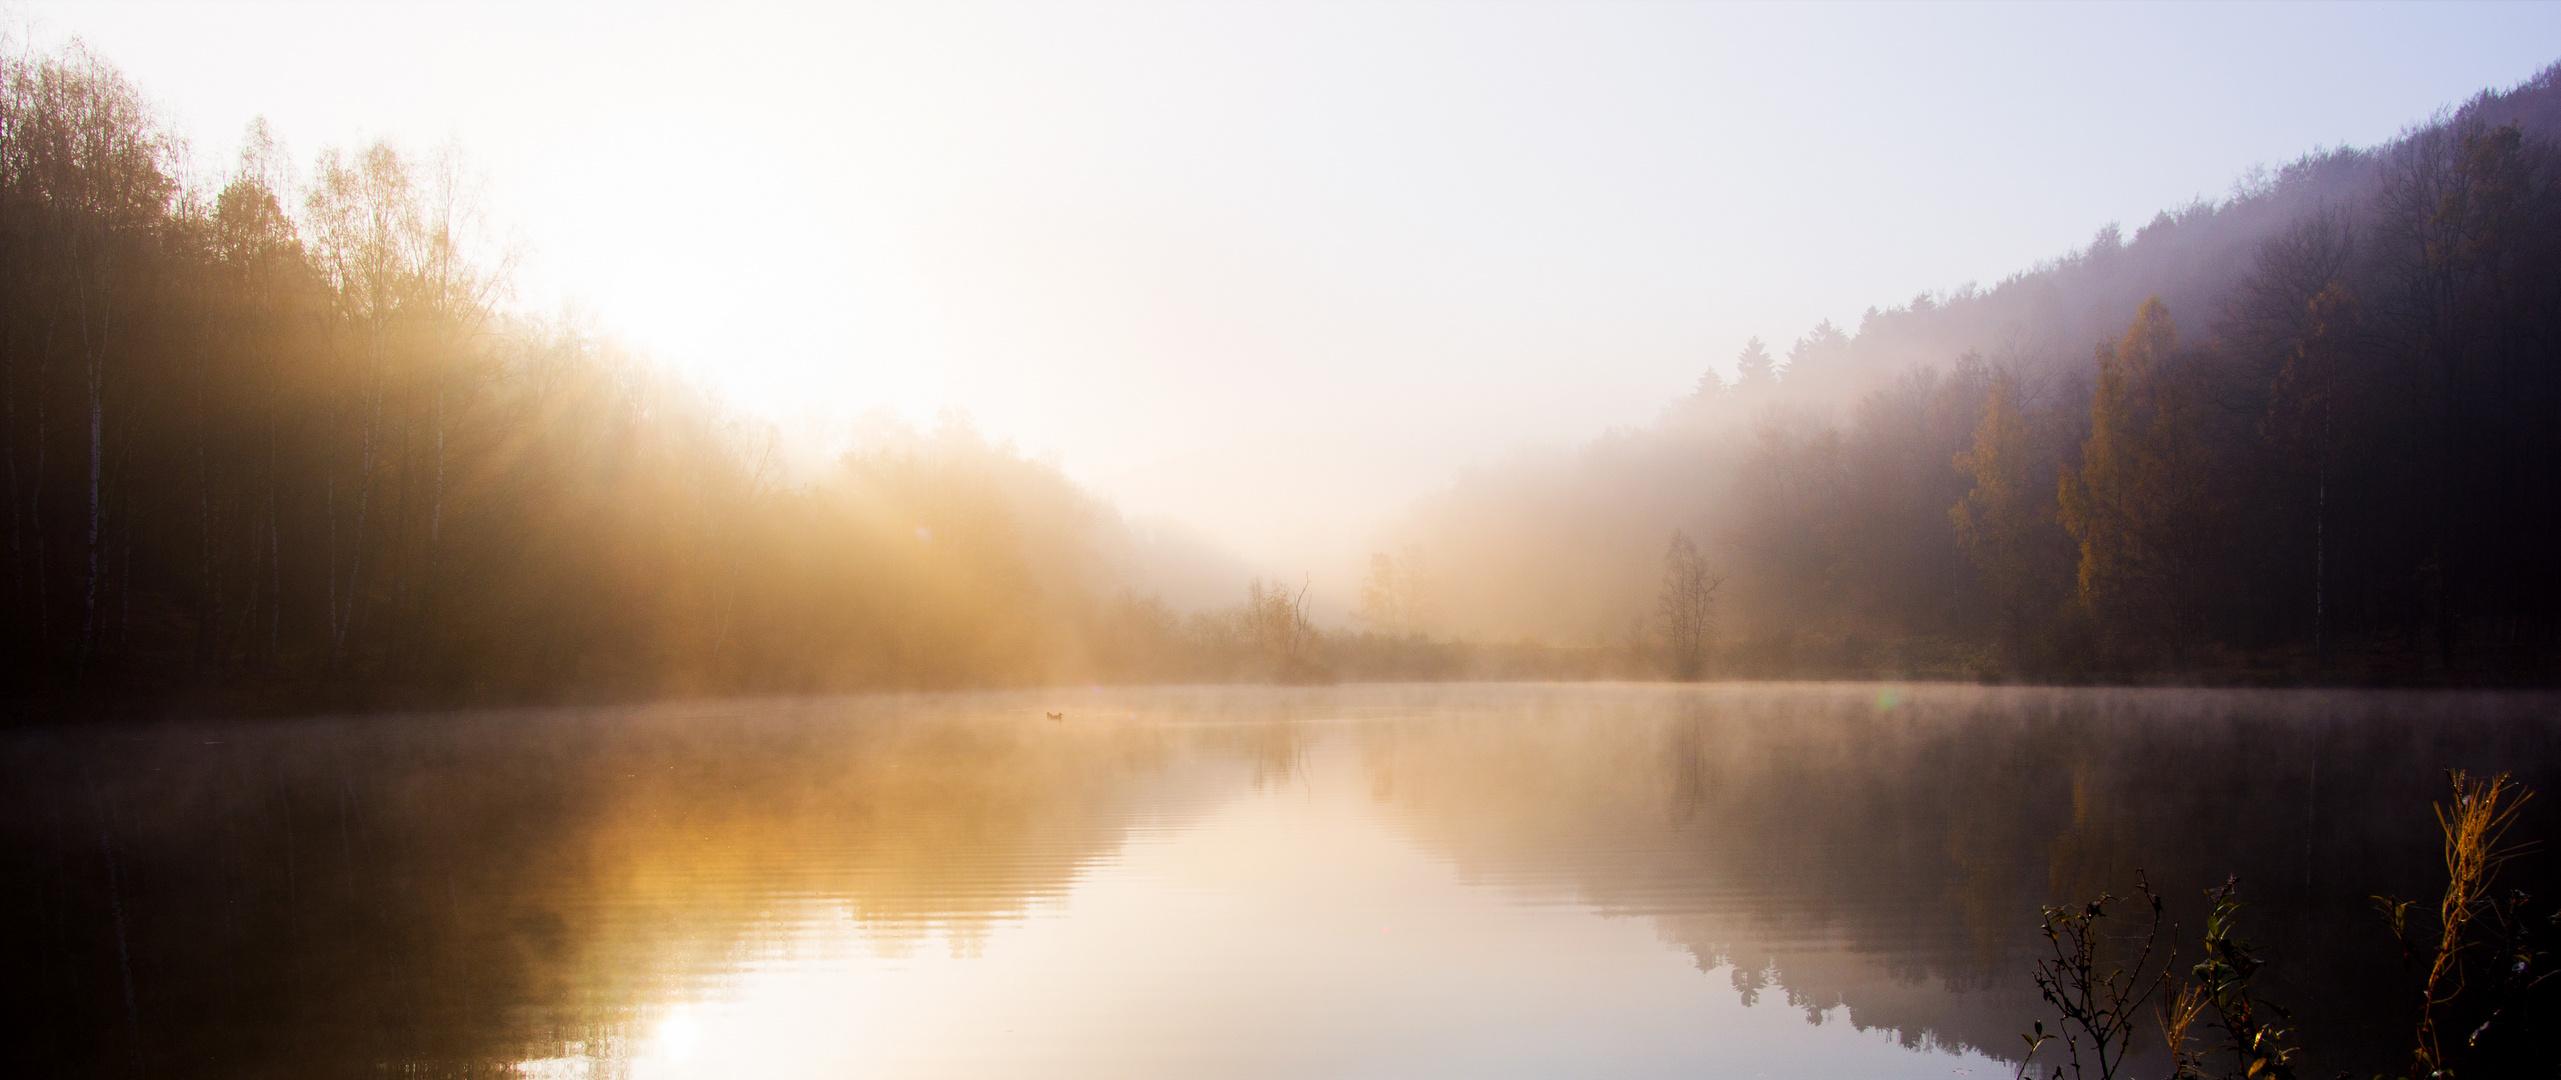 Nature DPC181 Serenity